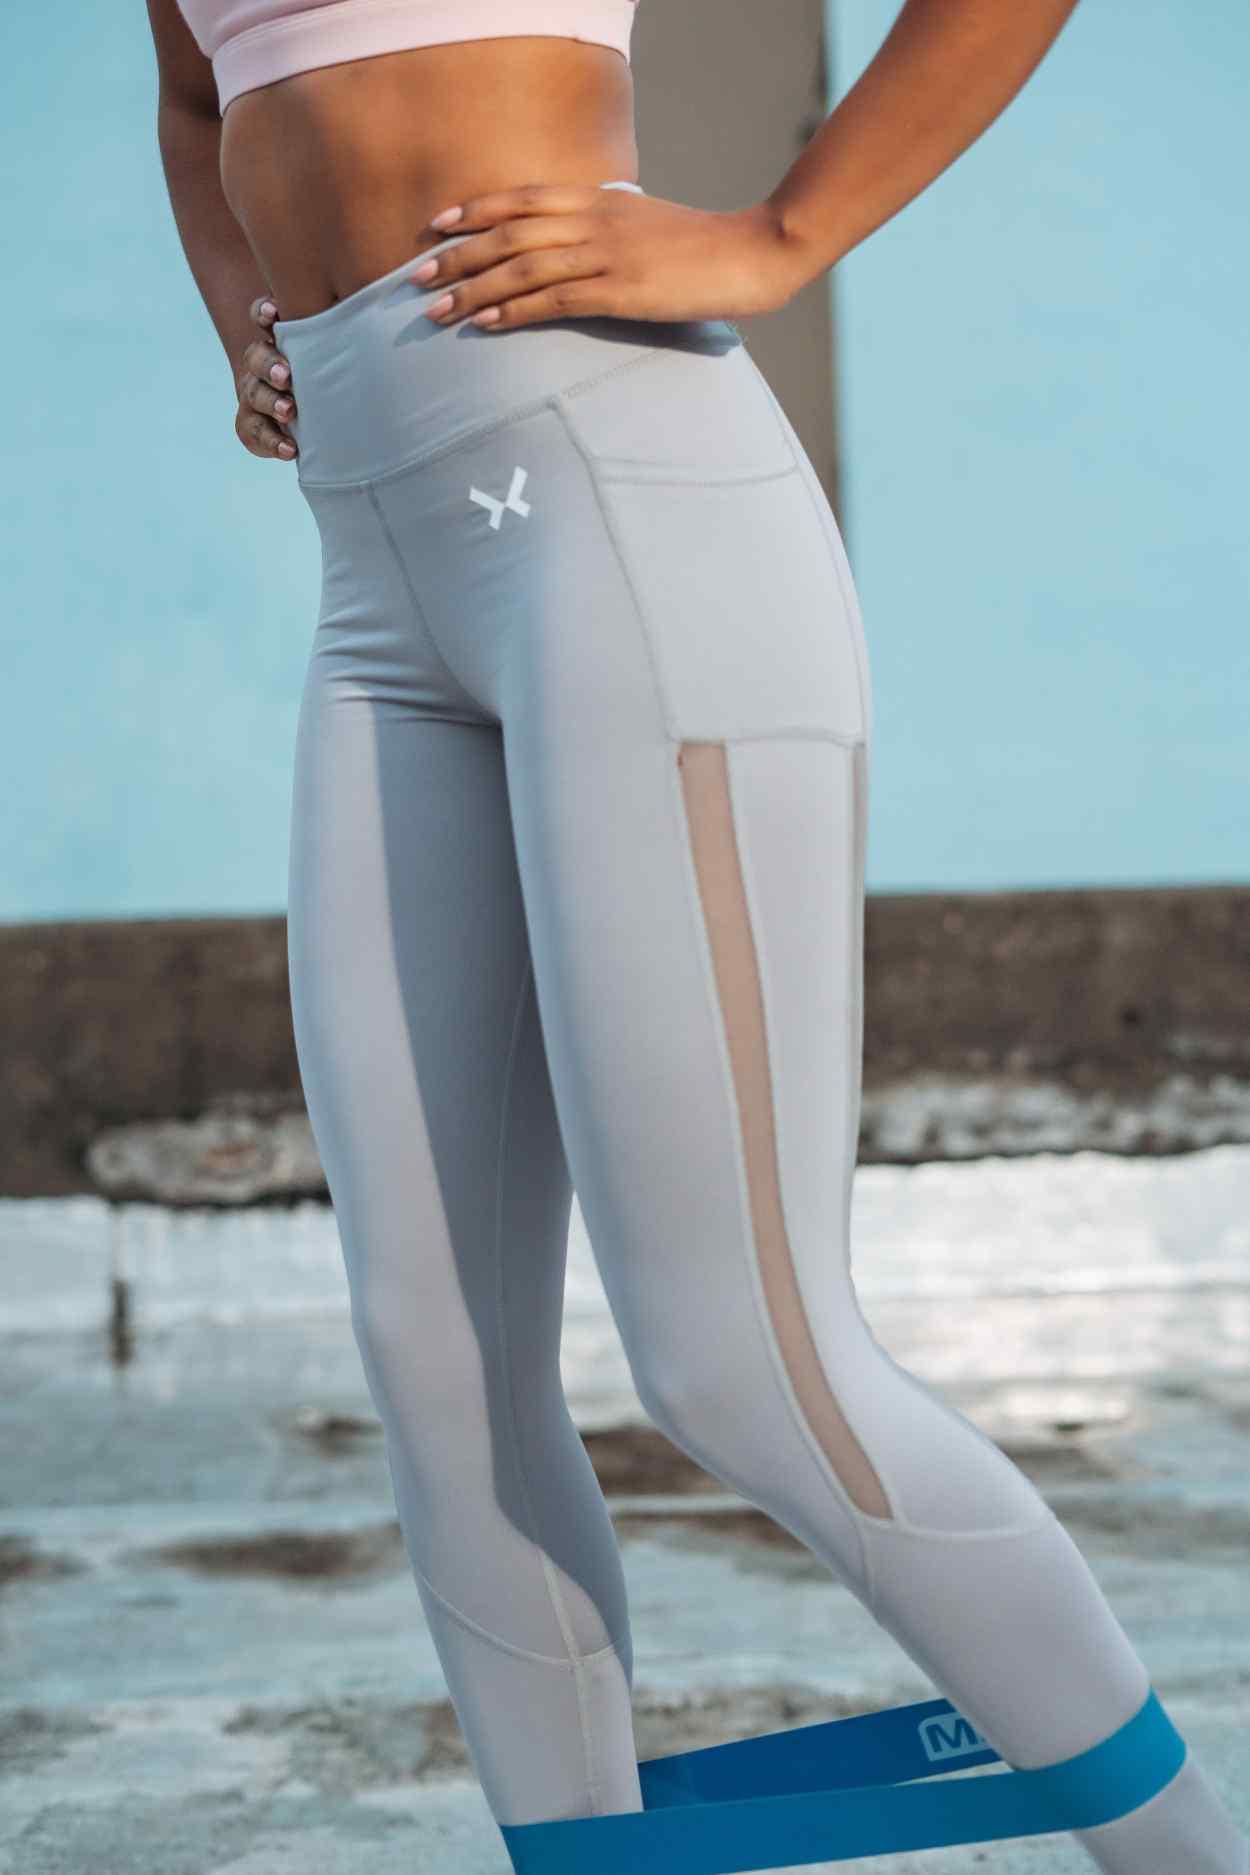 Tipos de leggins